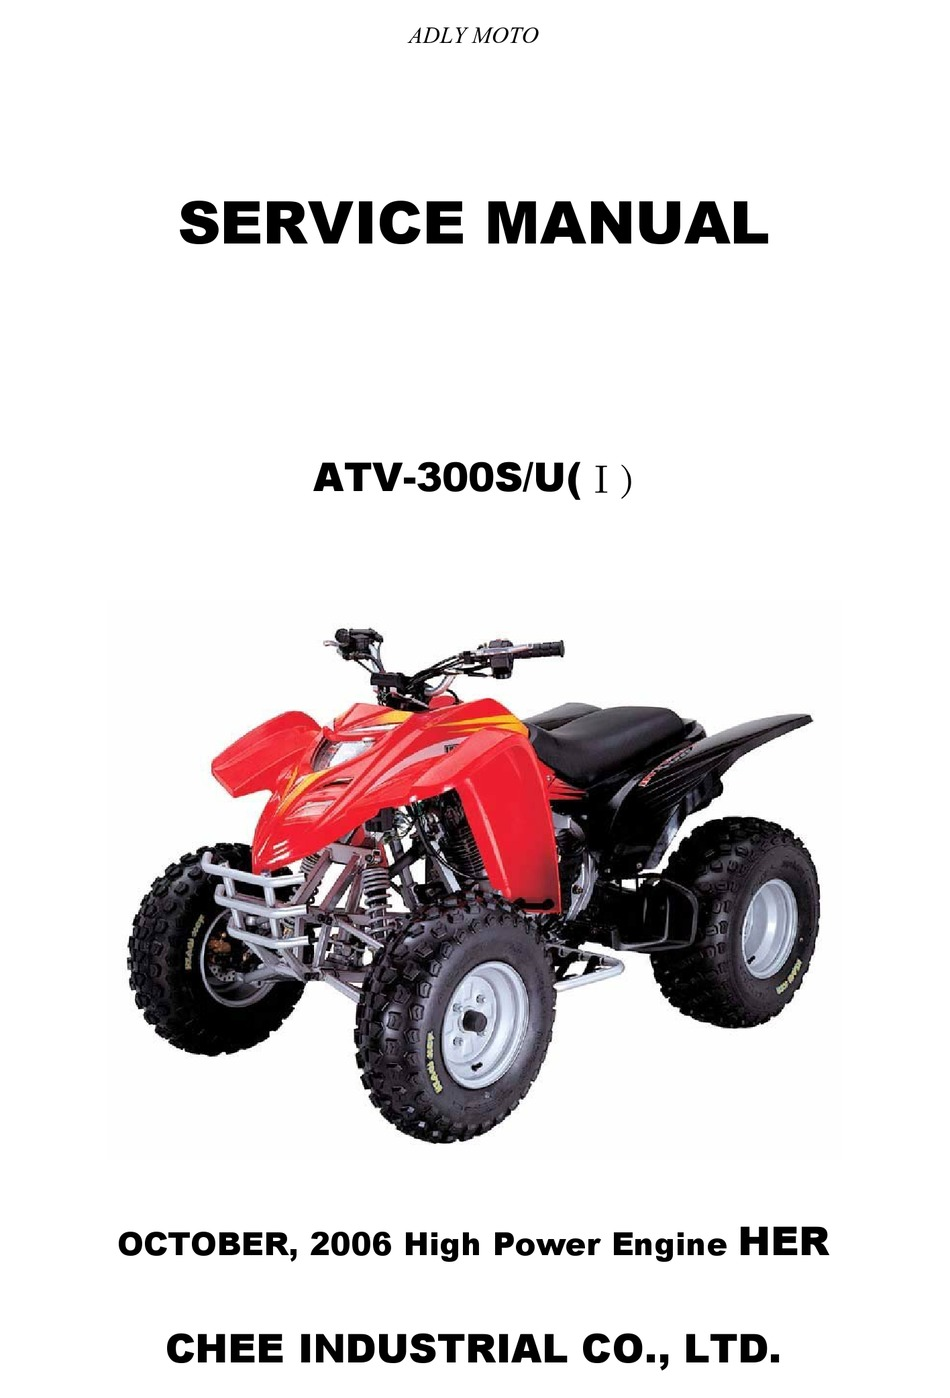 ADLY MOTO ATV-300 SERVICE MANUAL Pdf Download   ManualsLib   Adly Atv Wiring Diagram      ManualsLib